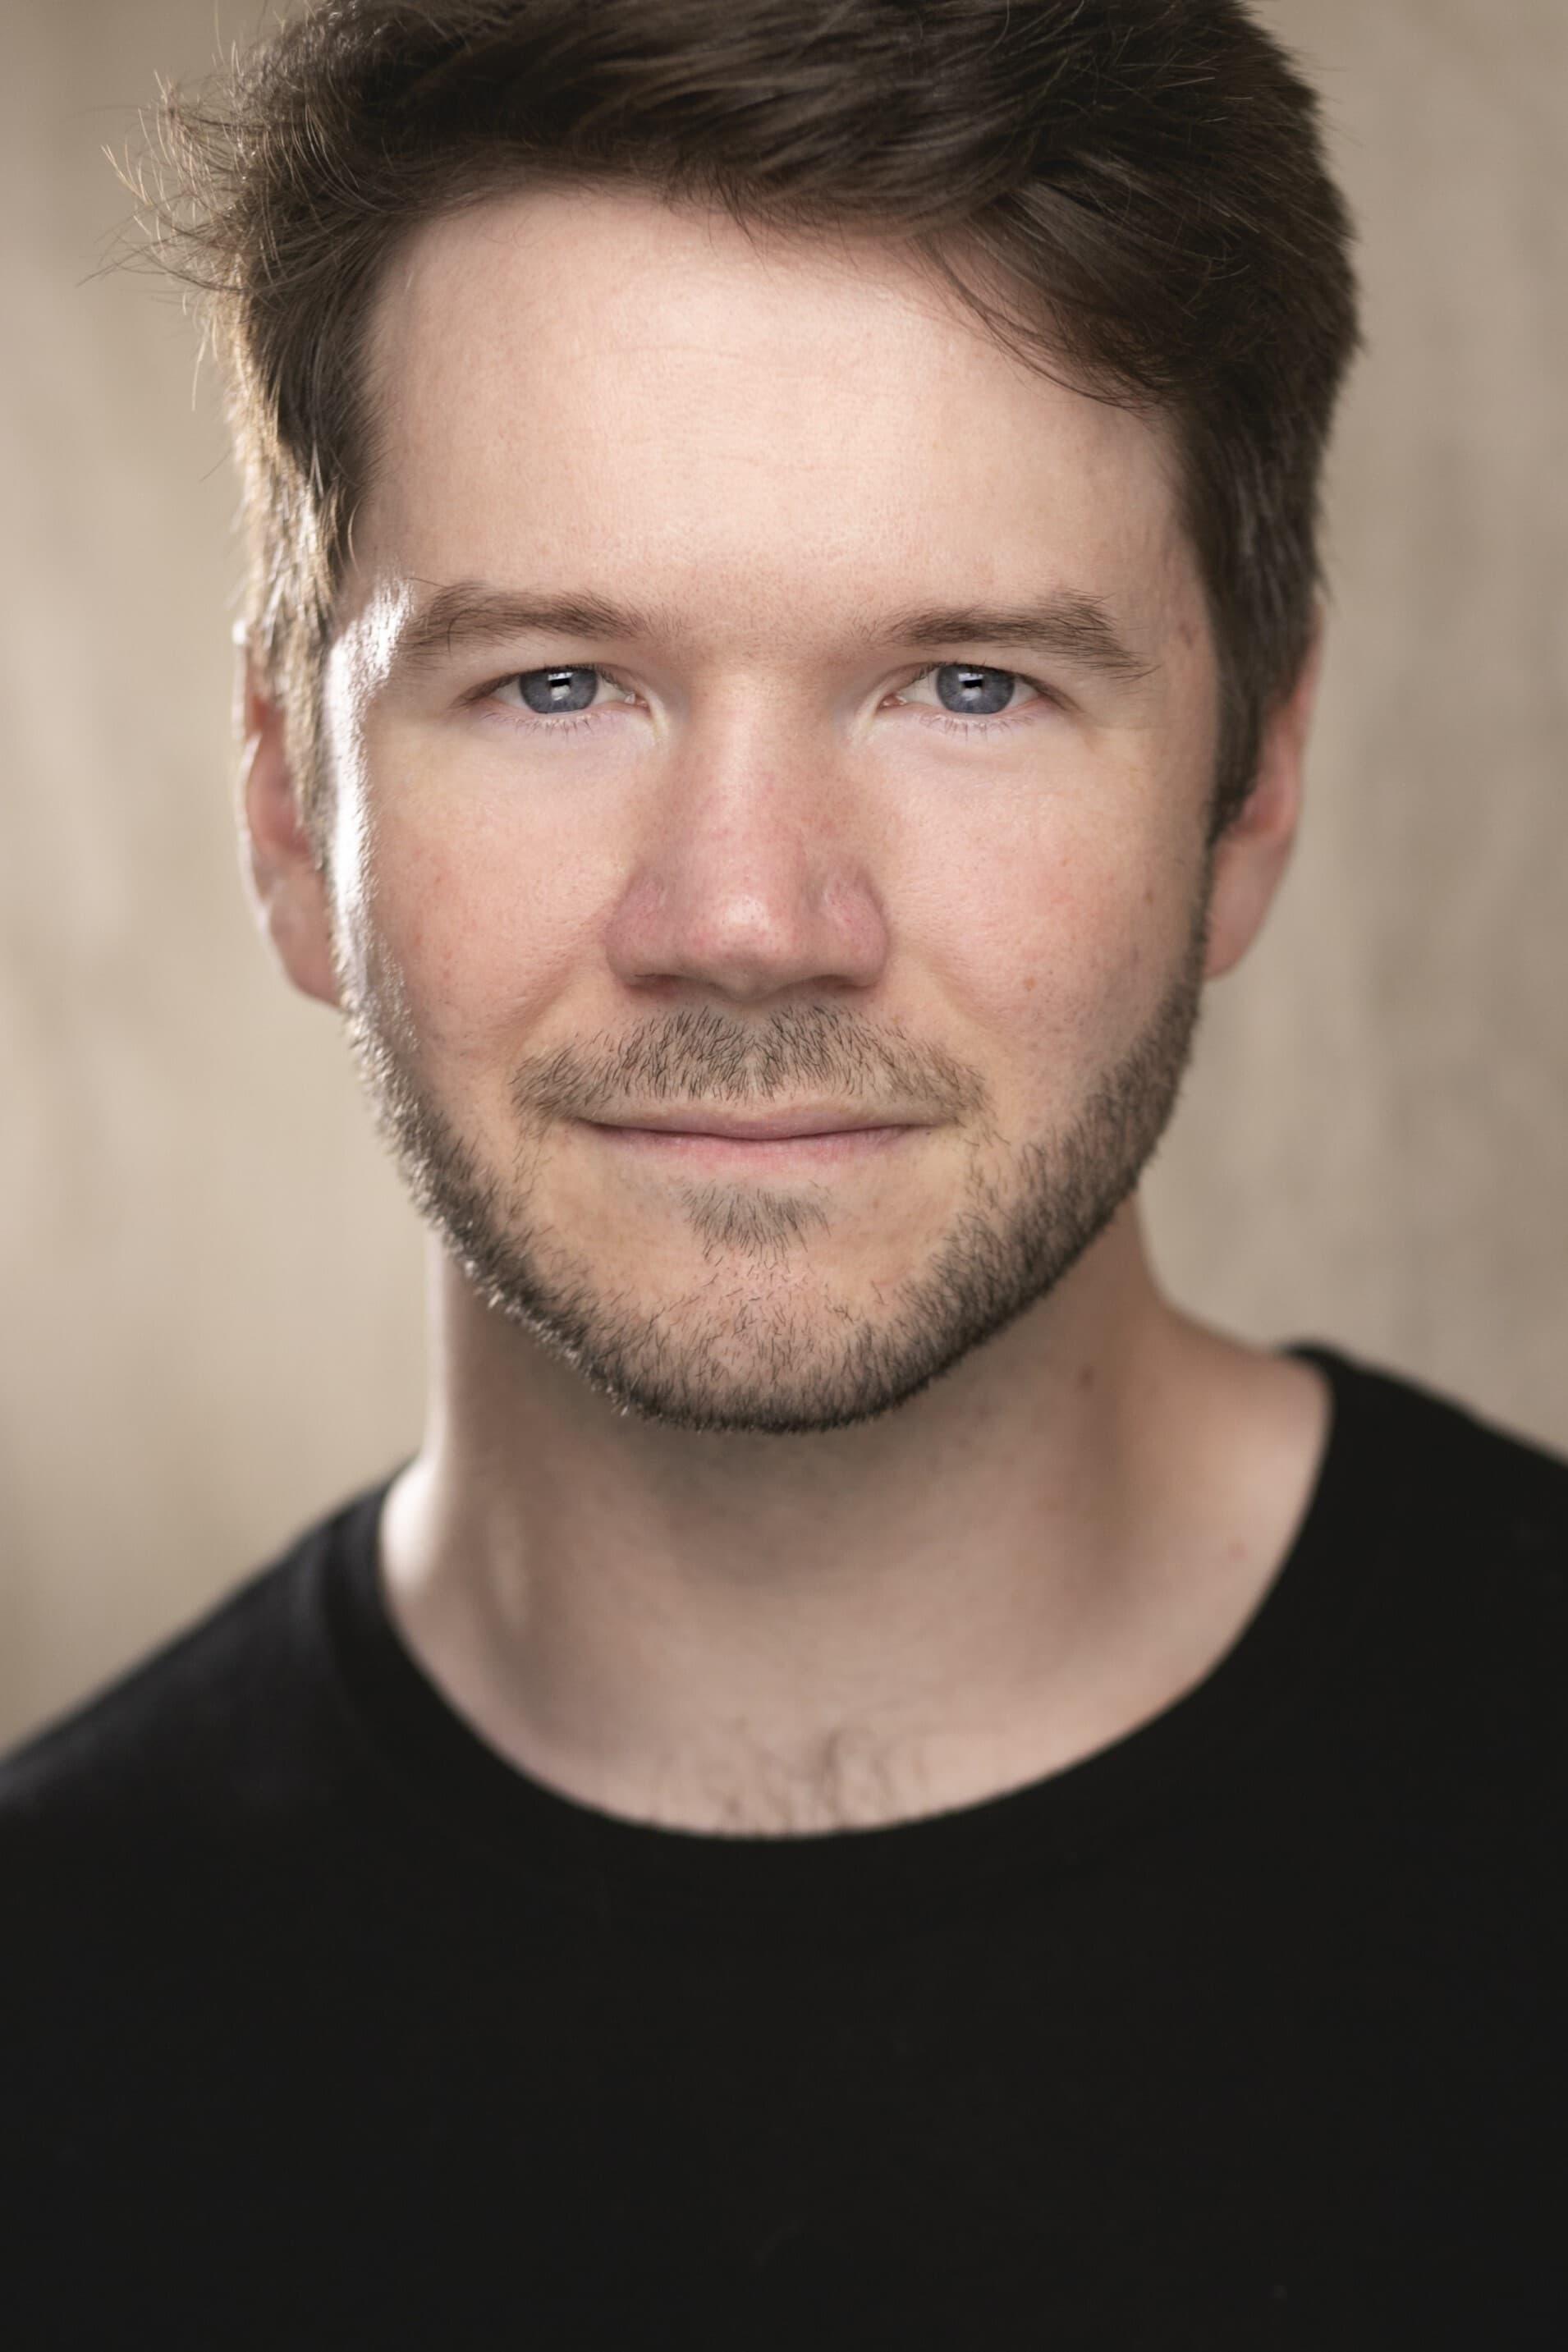 James Caverly